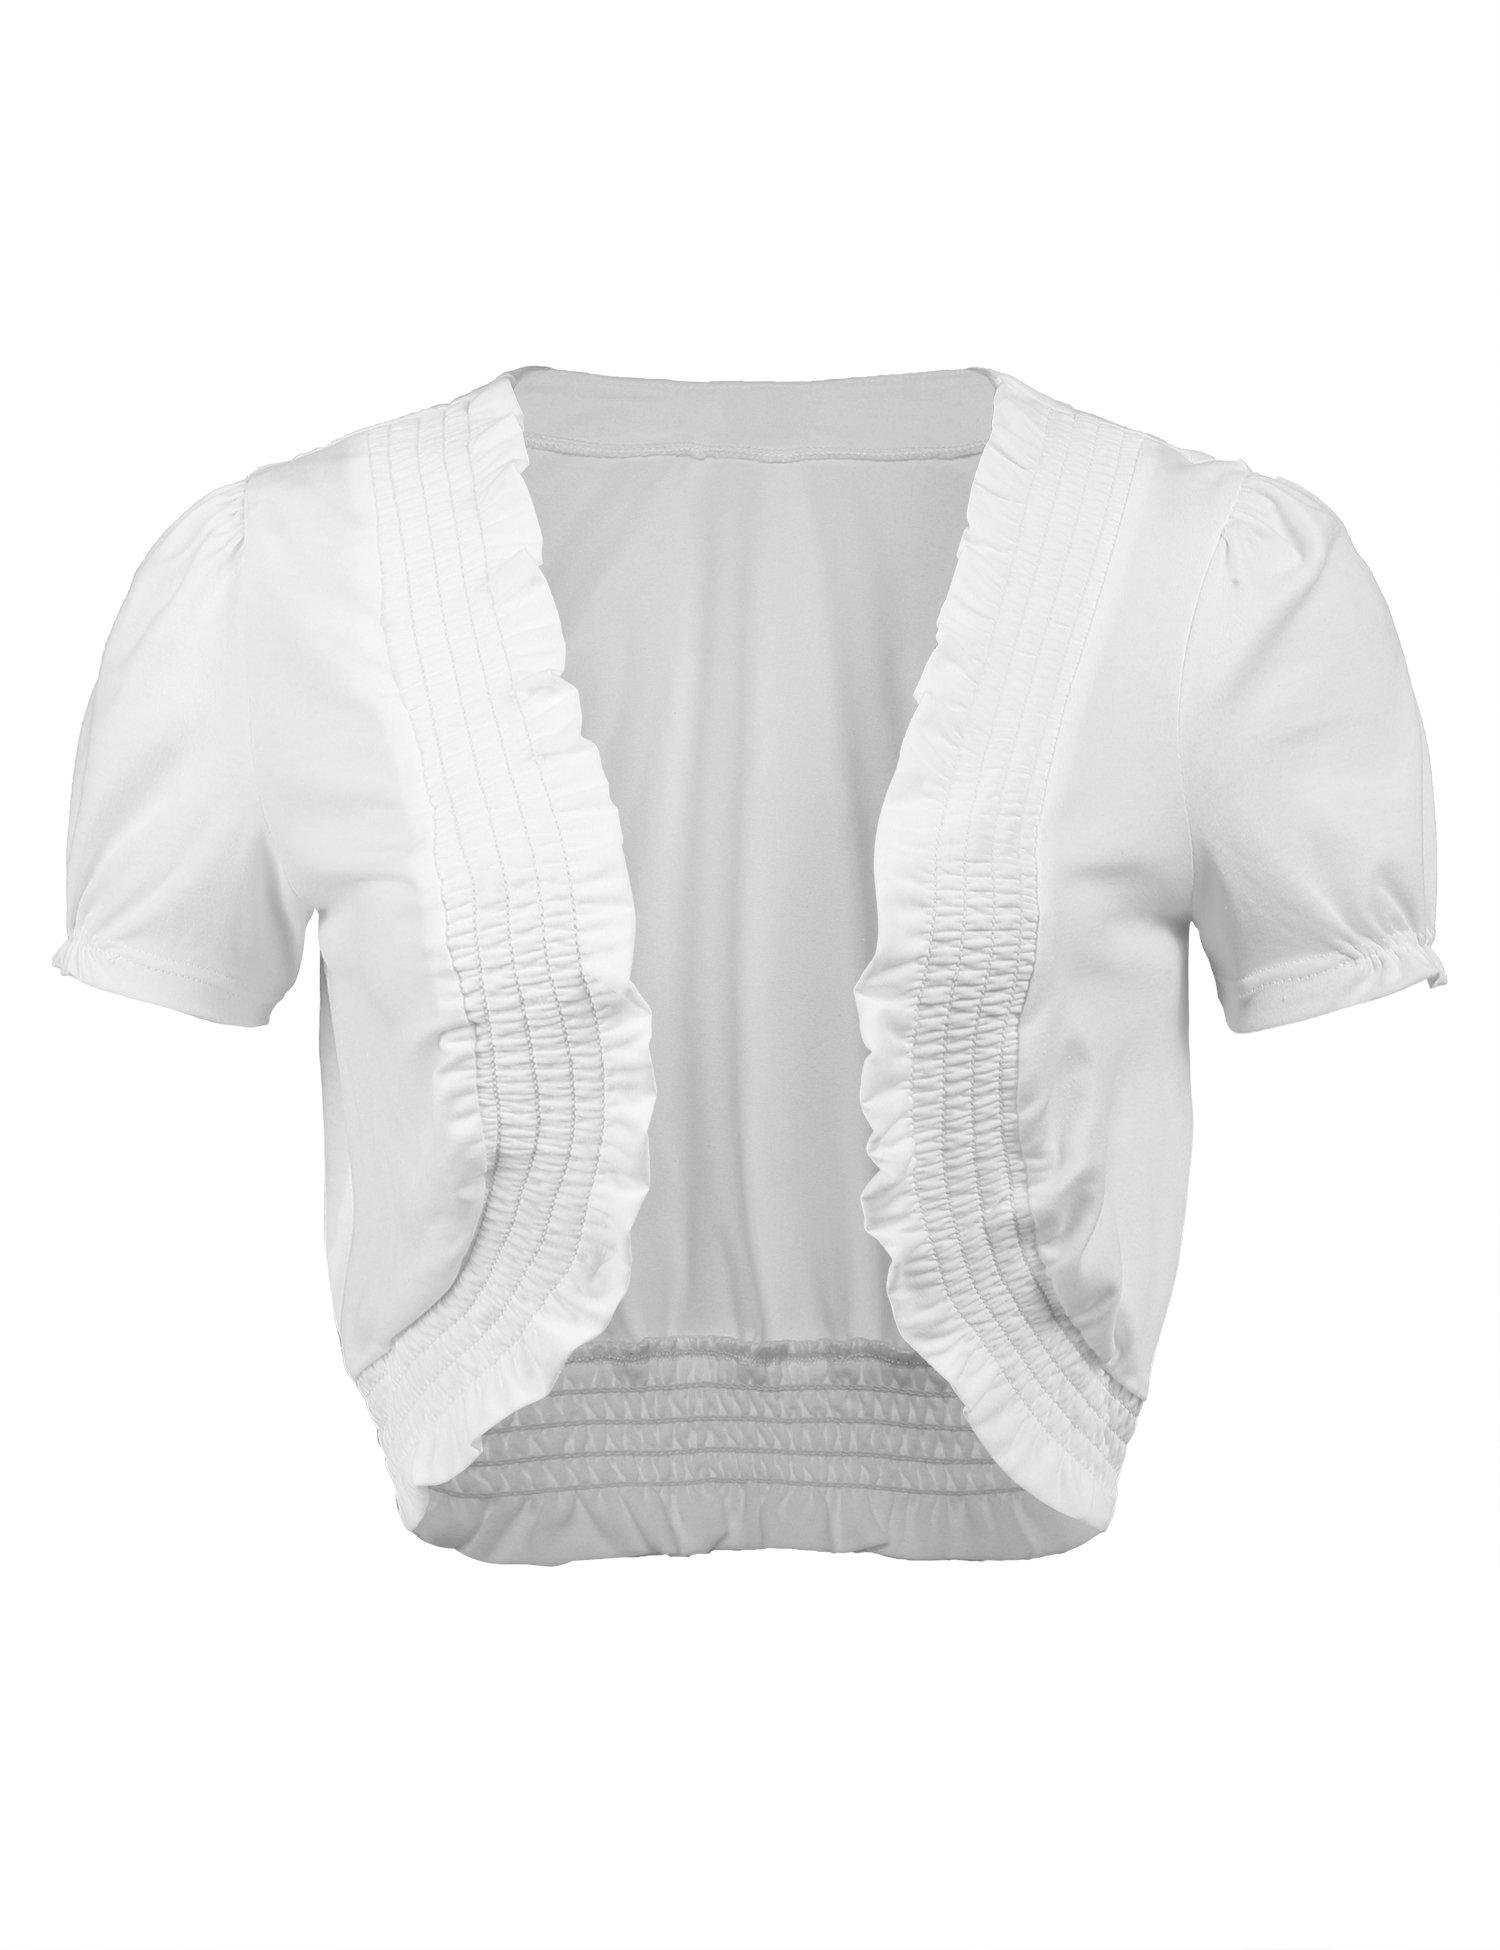 Concep Women's Short Sleeve Cardigan Open Front White Front Shirred Shrug Bolero